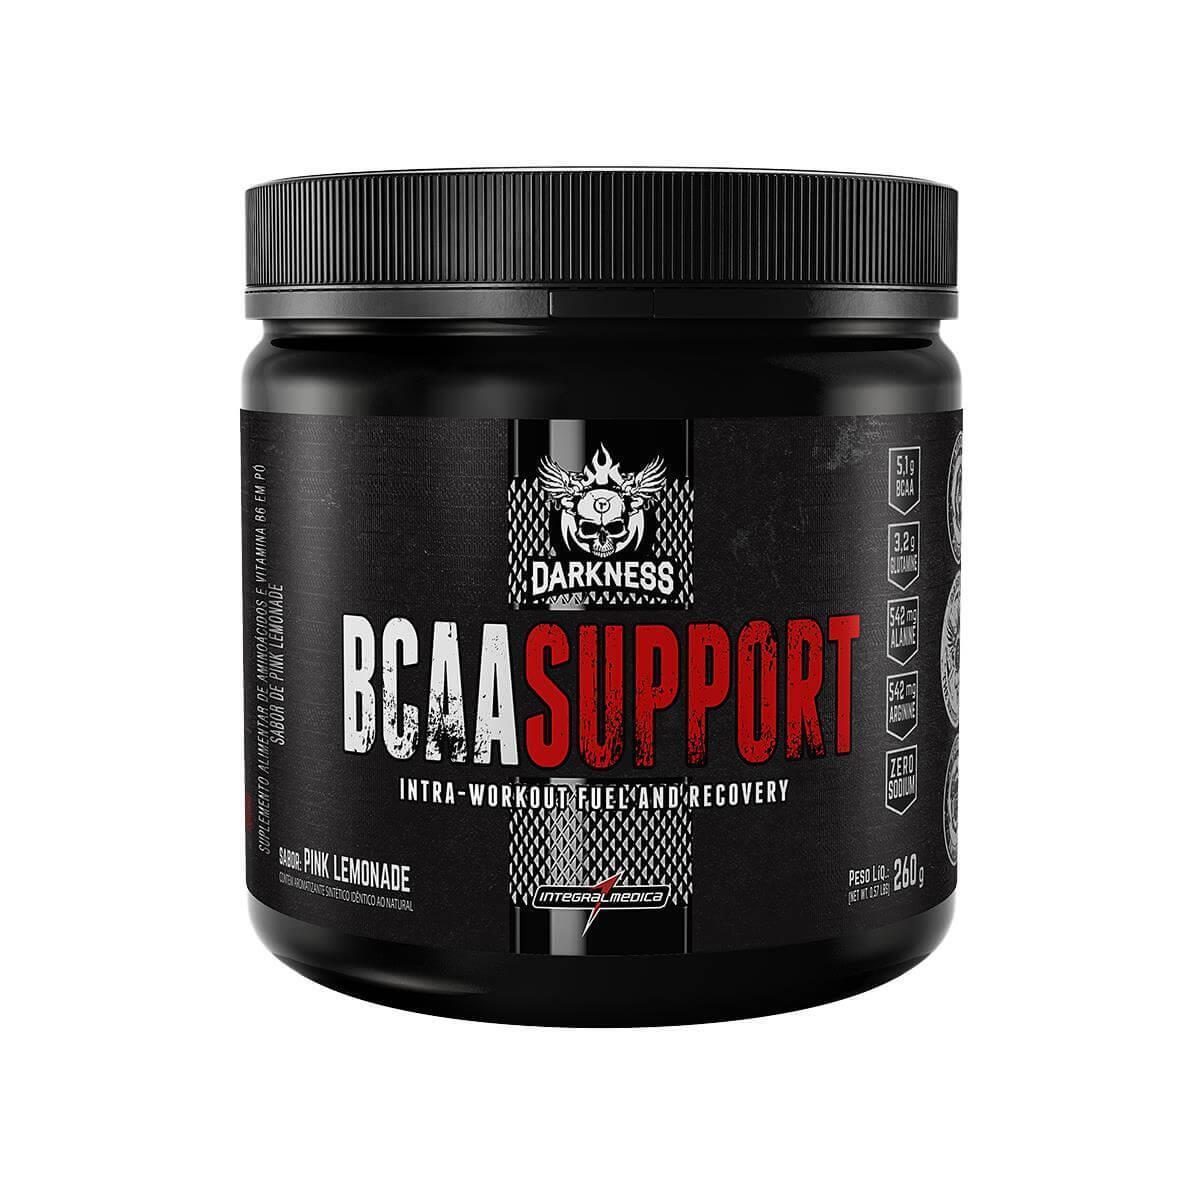 Bcaa Support 280g - Darkness